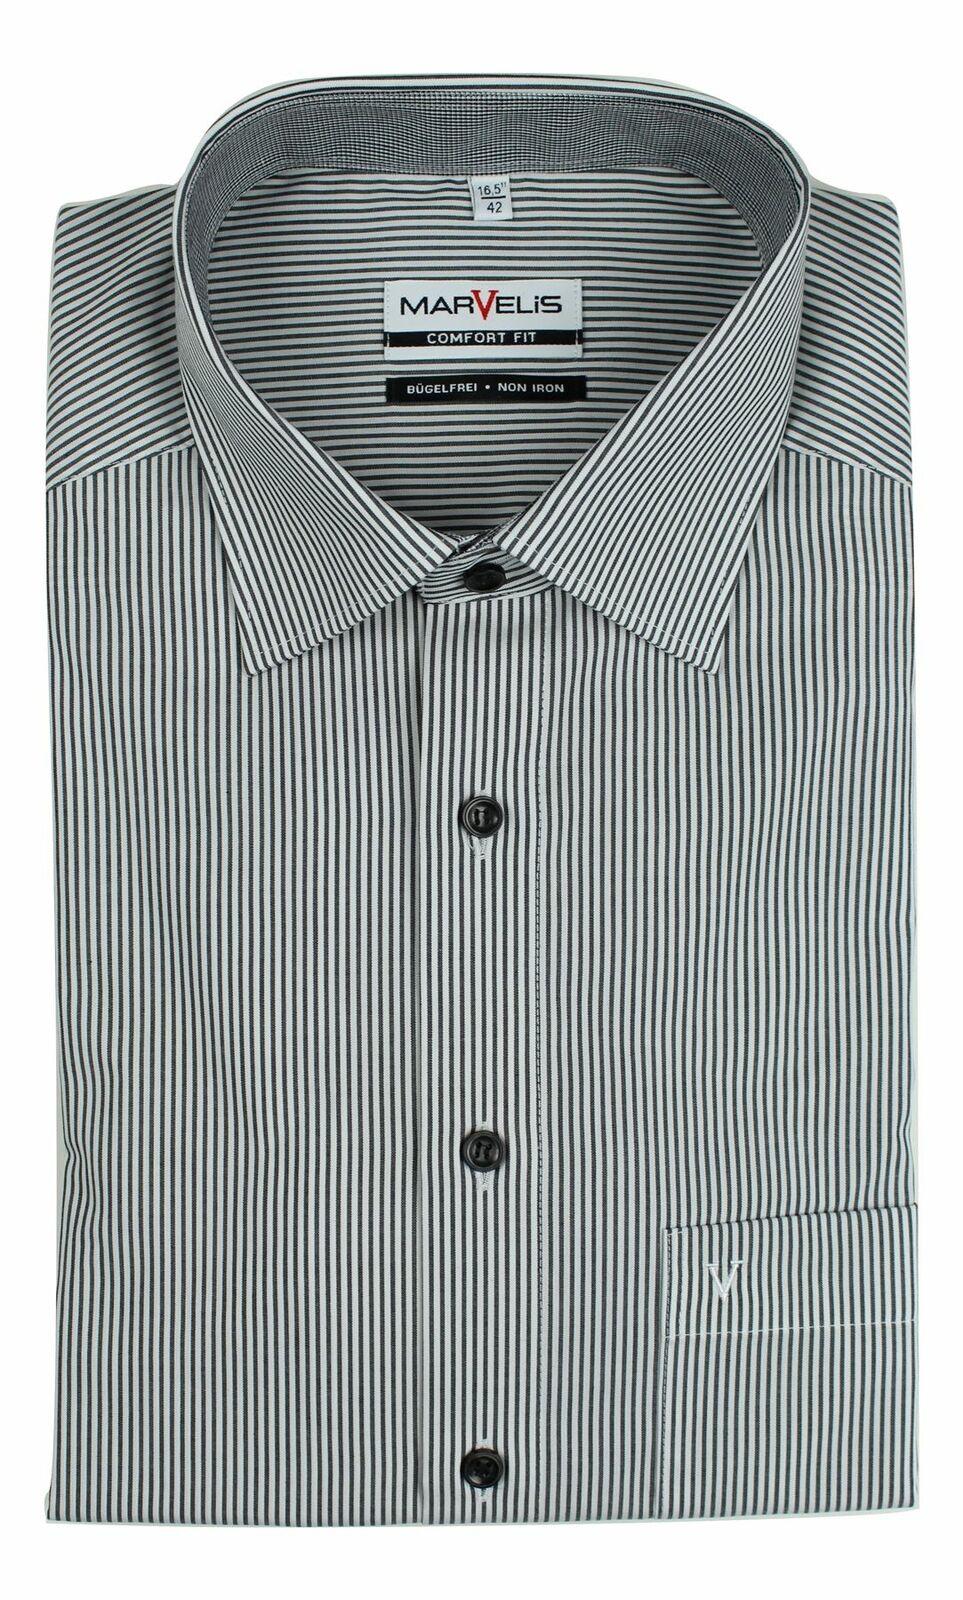 Charcoal Stripe Contrast Spread Collar